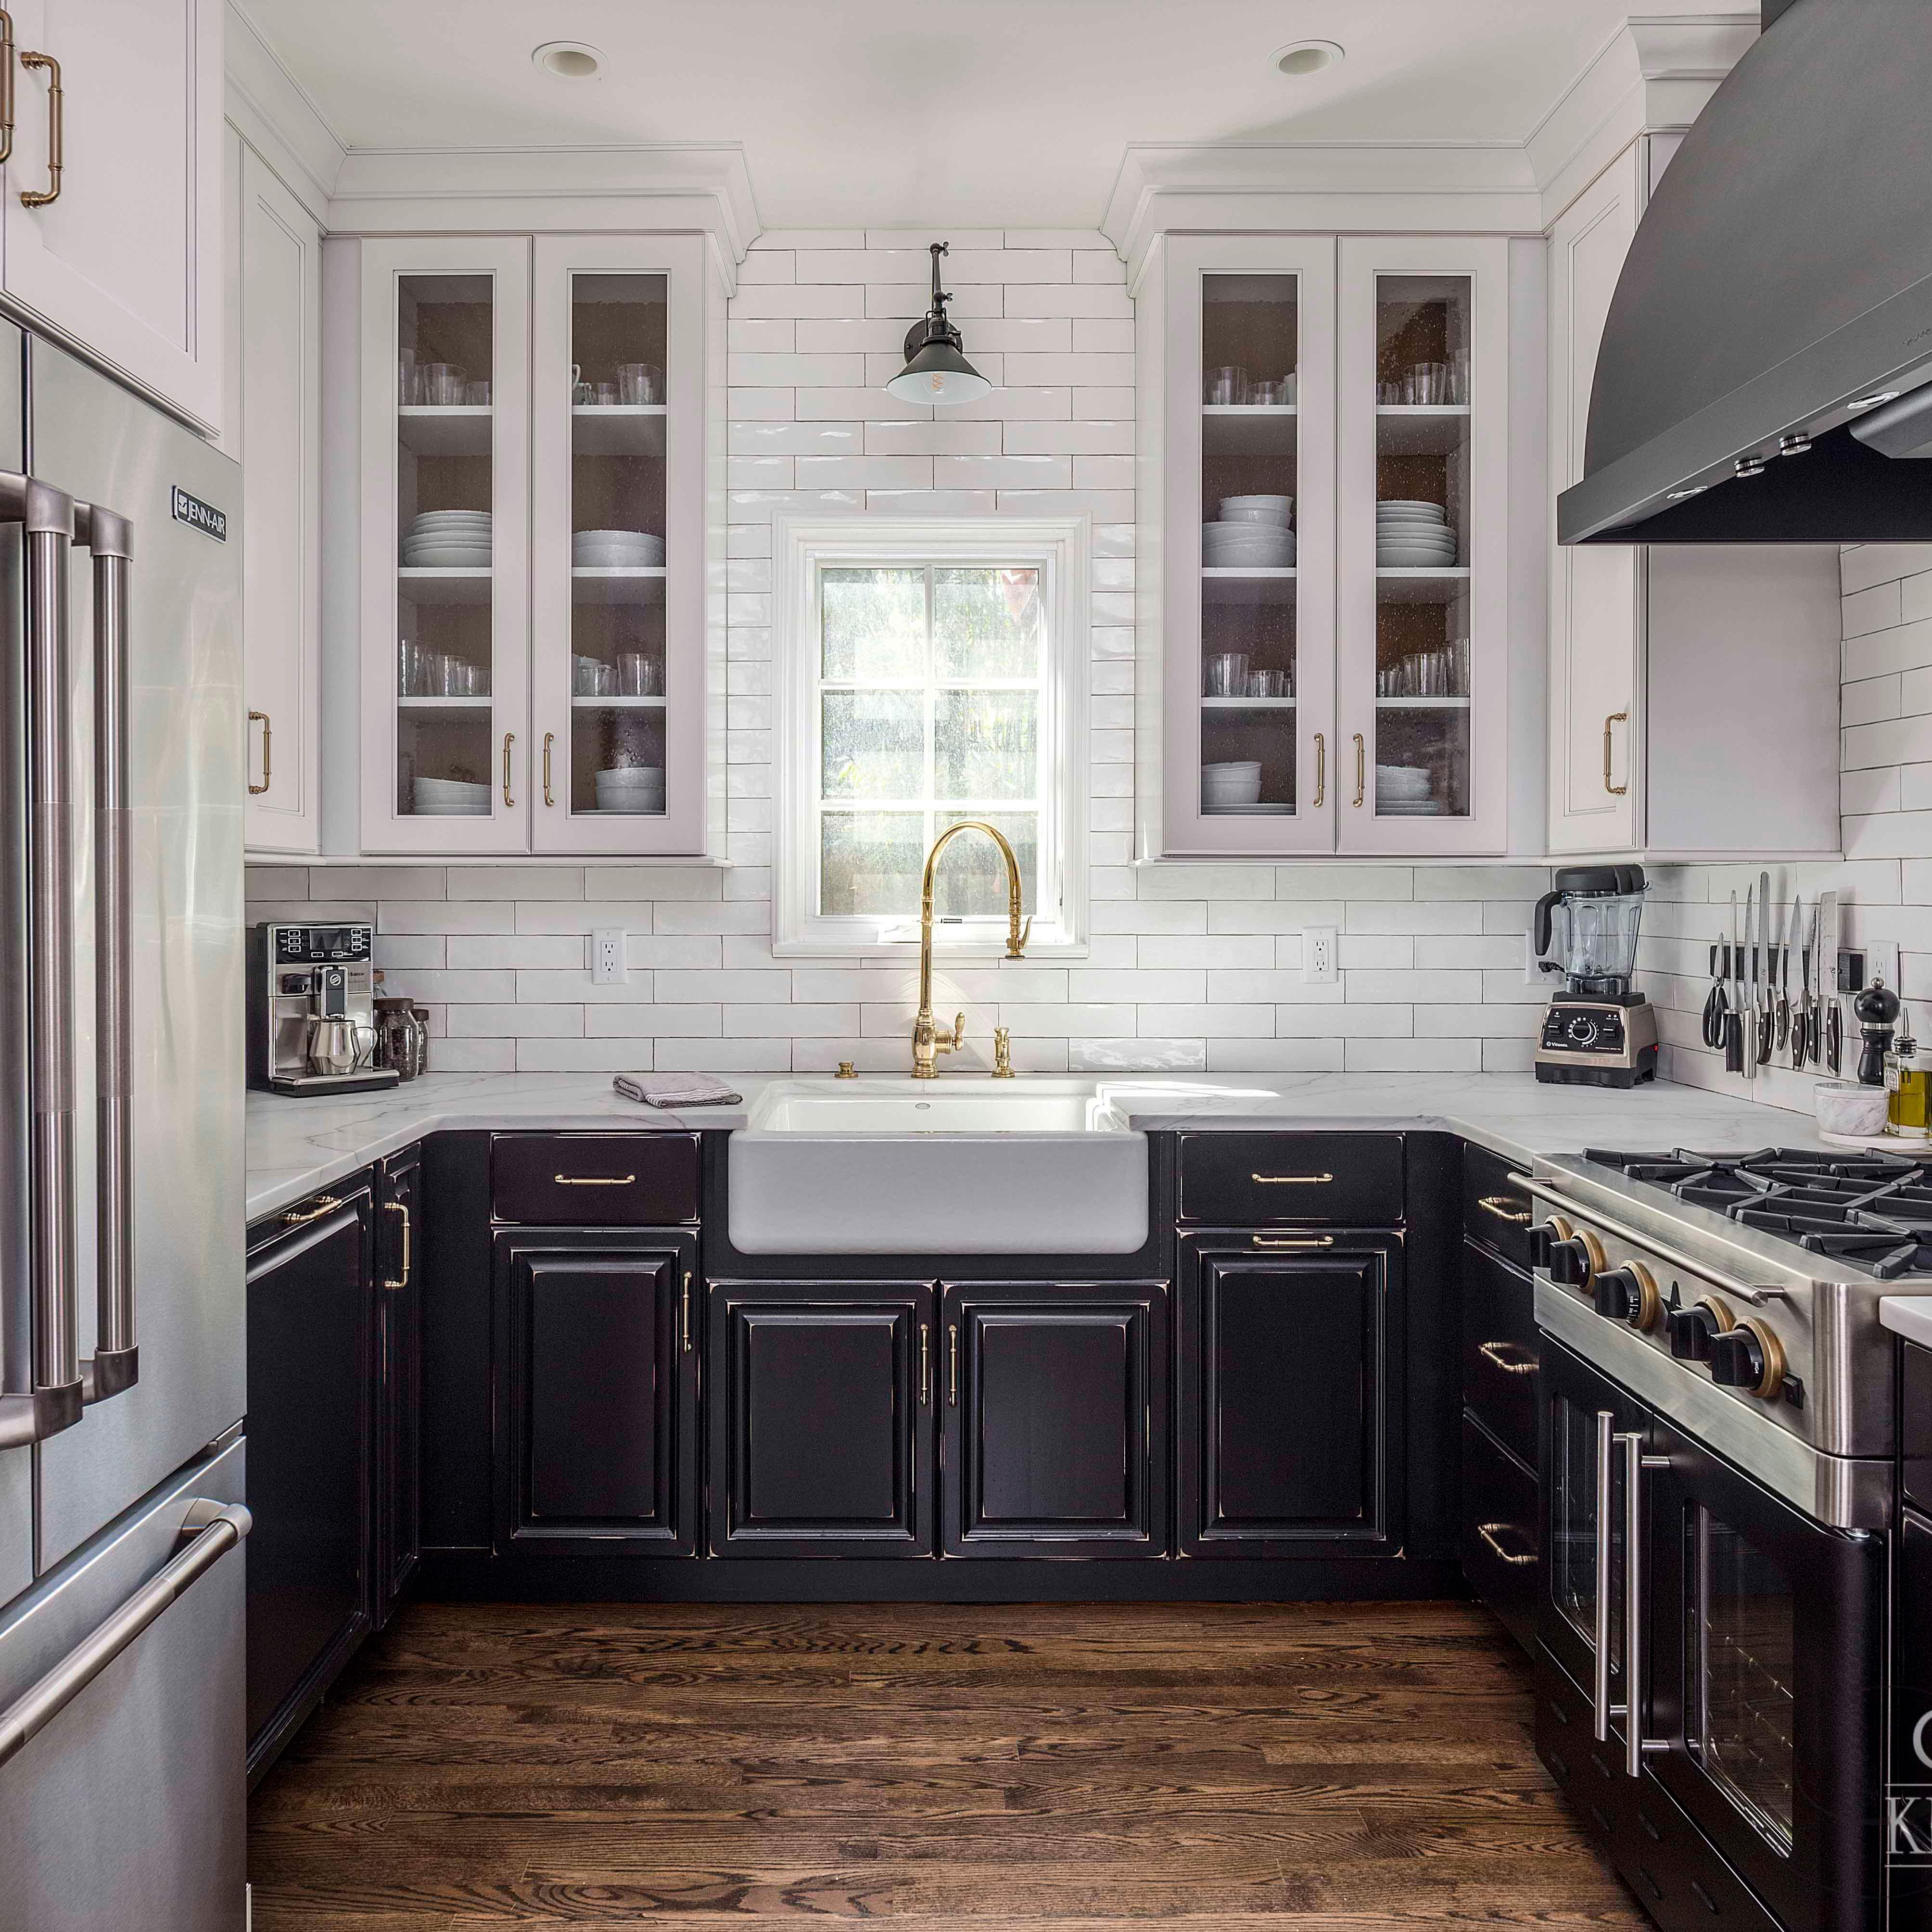 S&W Kitchens image 10